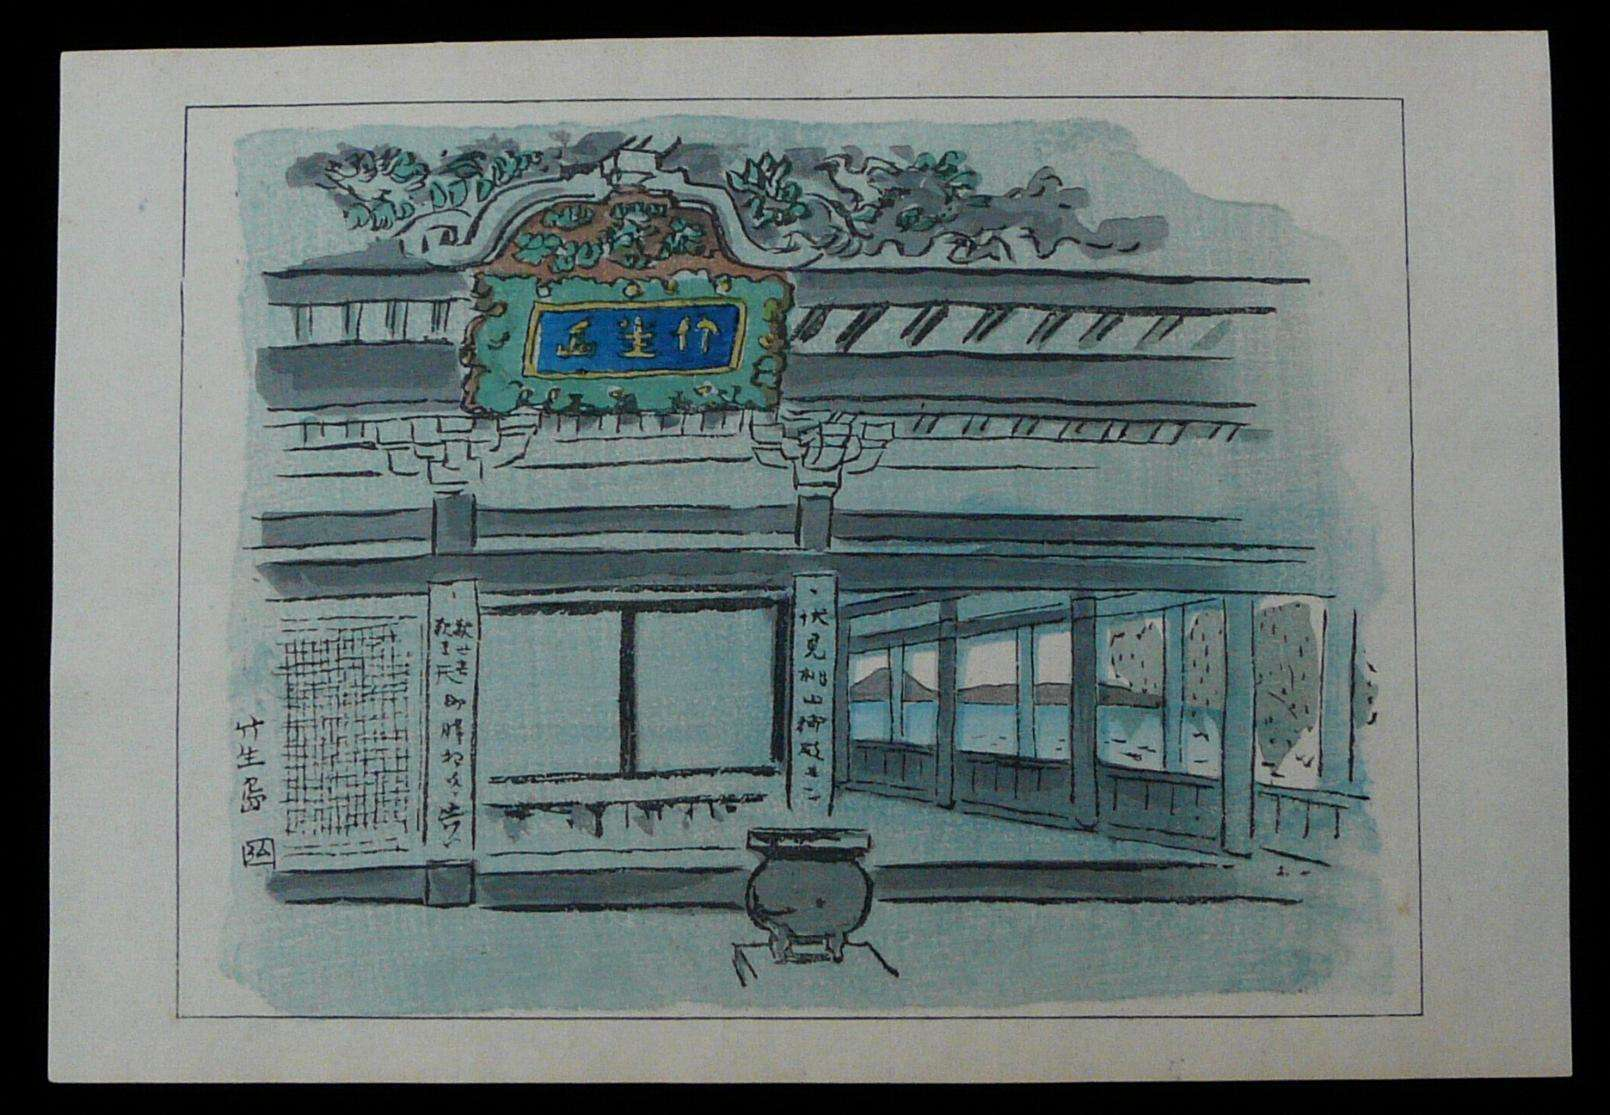 HIROMITSU NAKAZAWA: #P2932 ORIGINAL FIRST EDITION JAPANESE WOODBLOCK PRINT